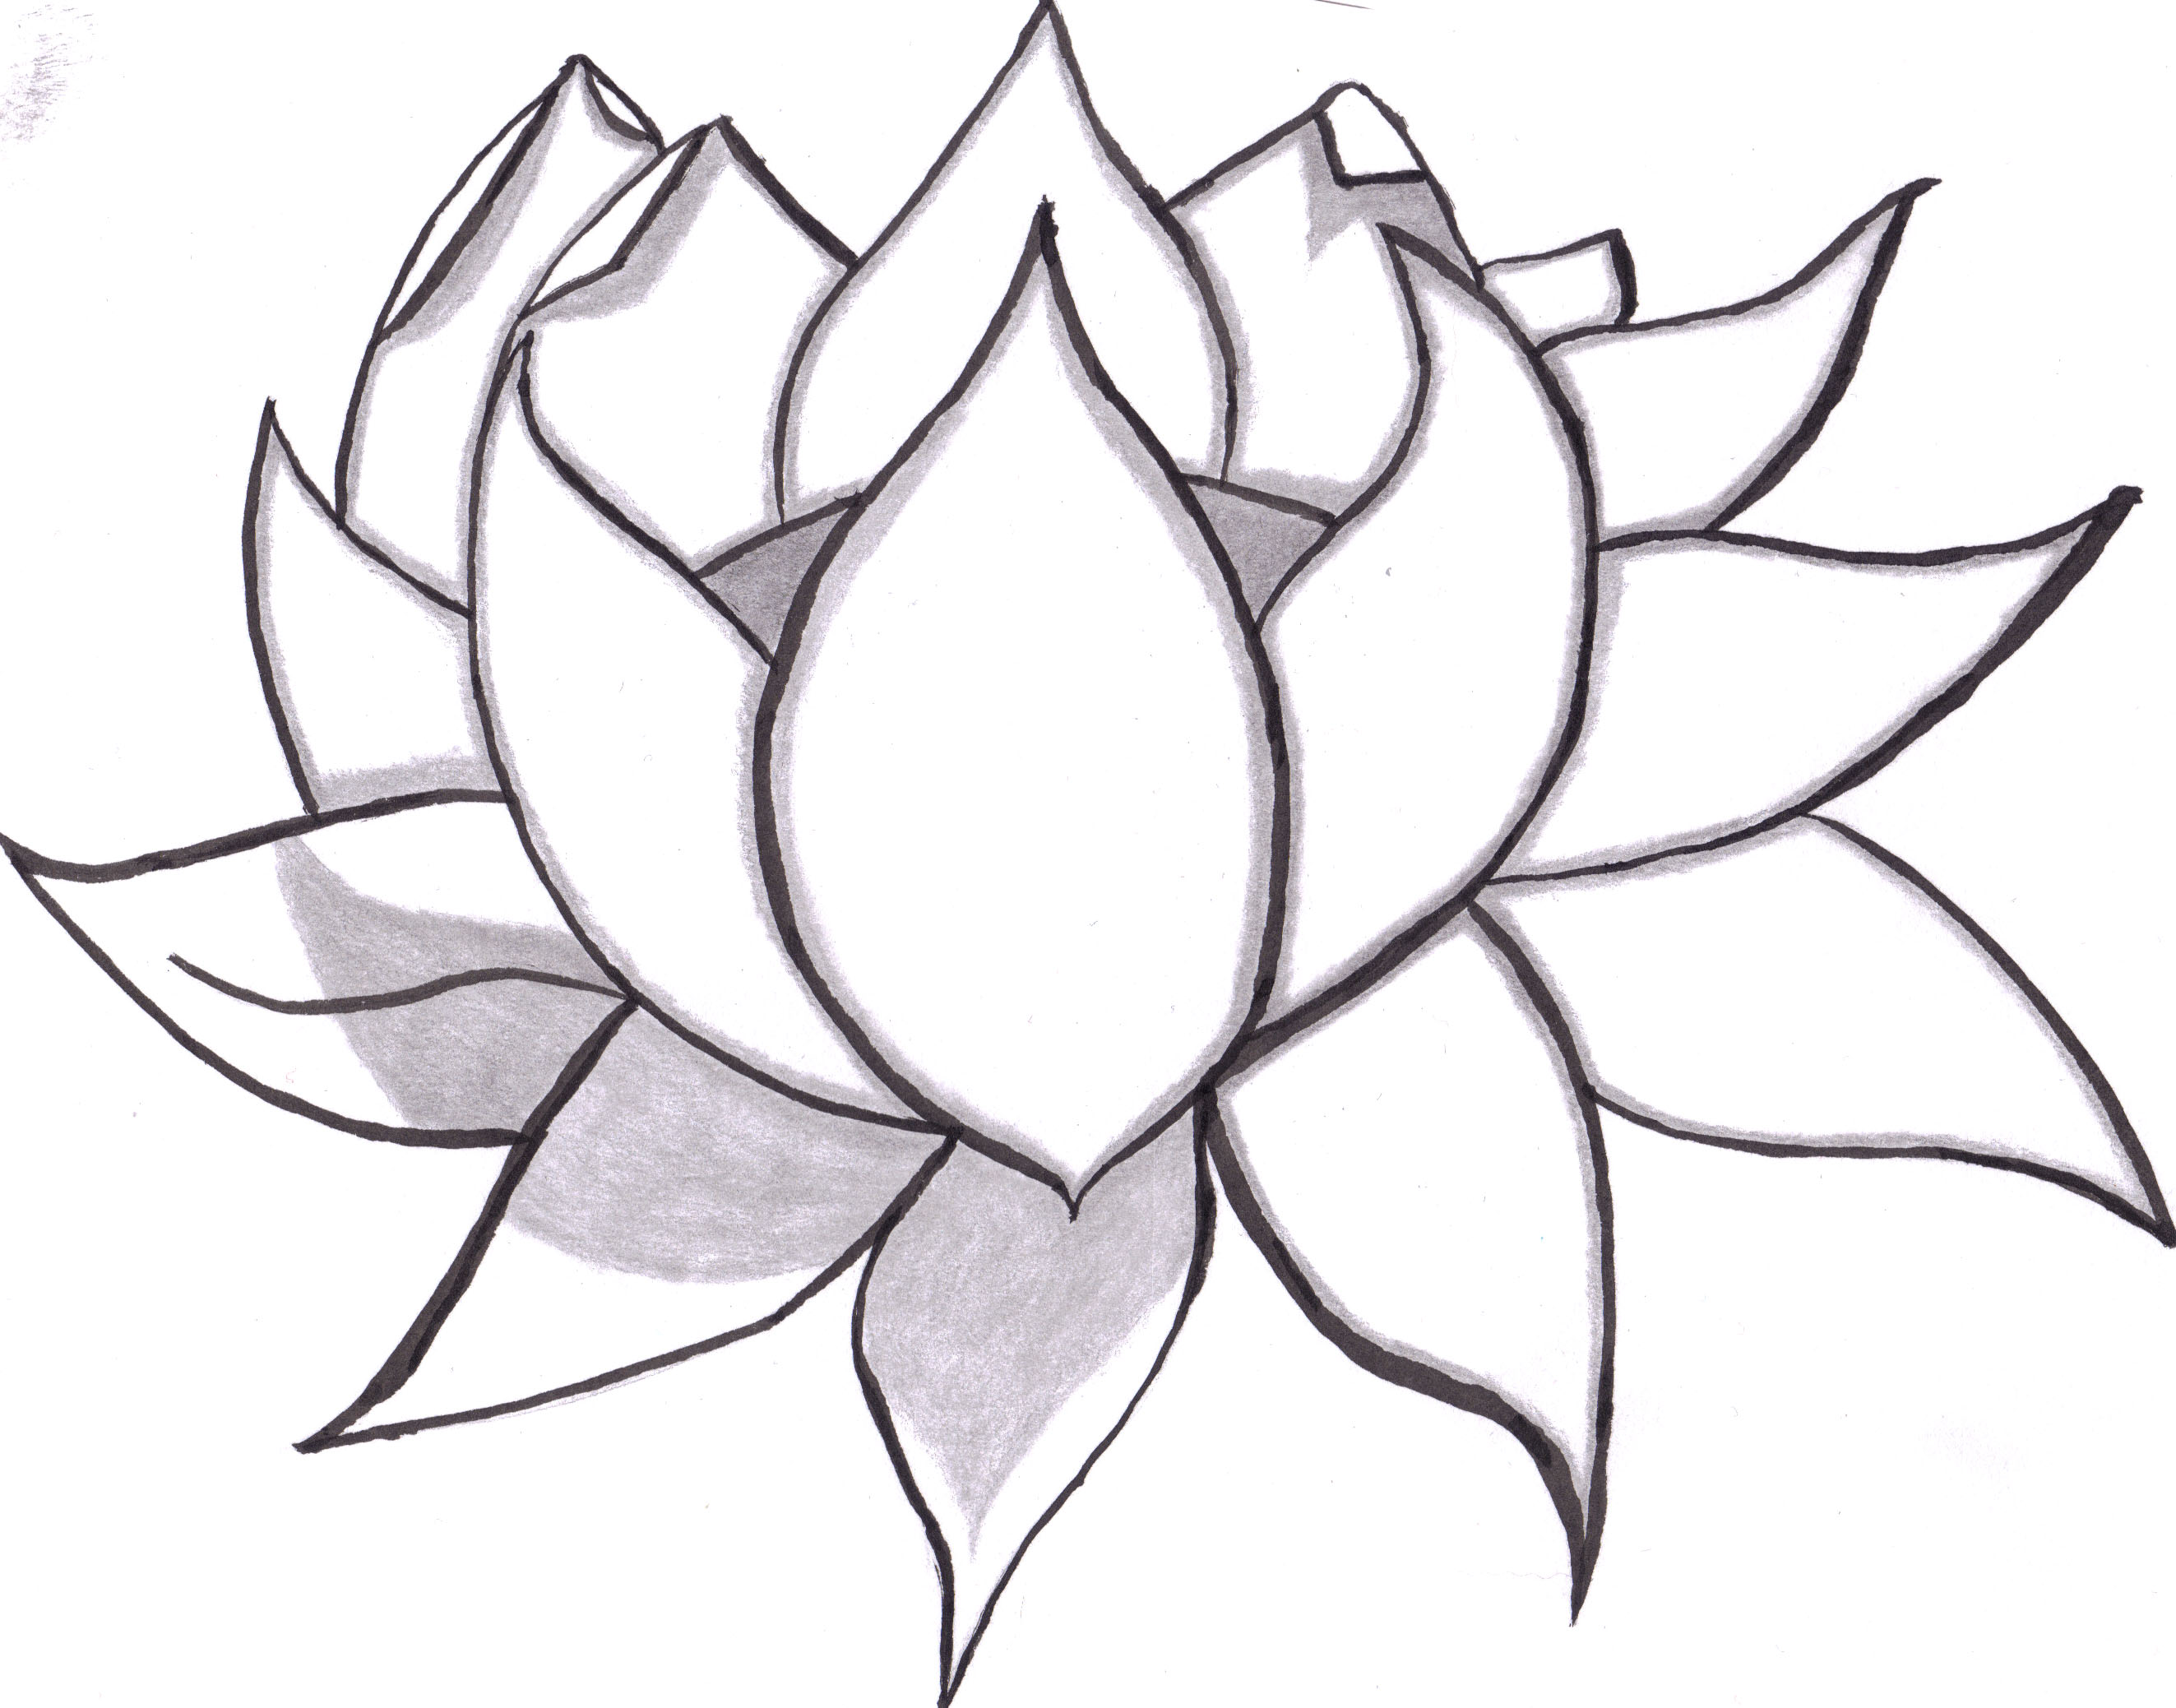 lotus flower drawing sketch clipart best